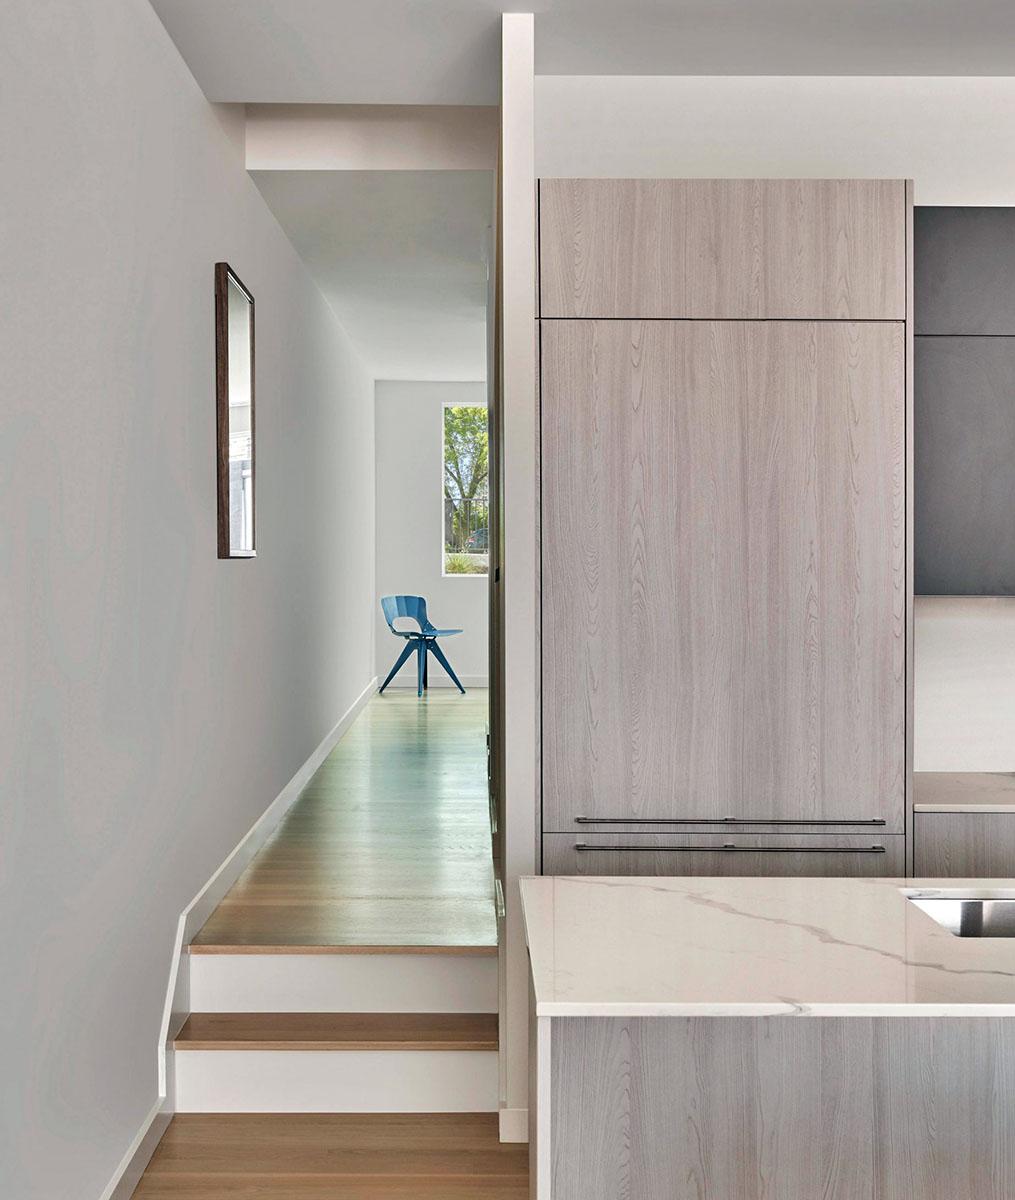 2016-West-Rice-Residences-Vladimir-Radutny-Architects-JC-Buck-Mike-Schwartz-06